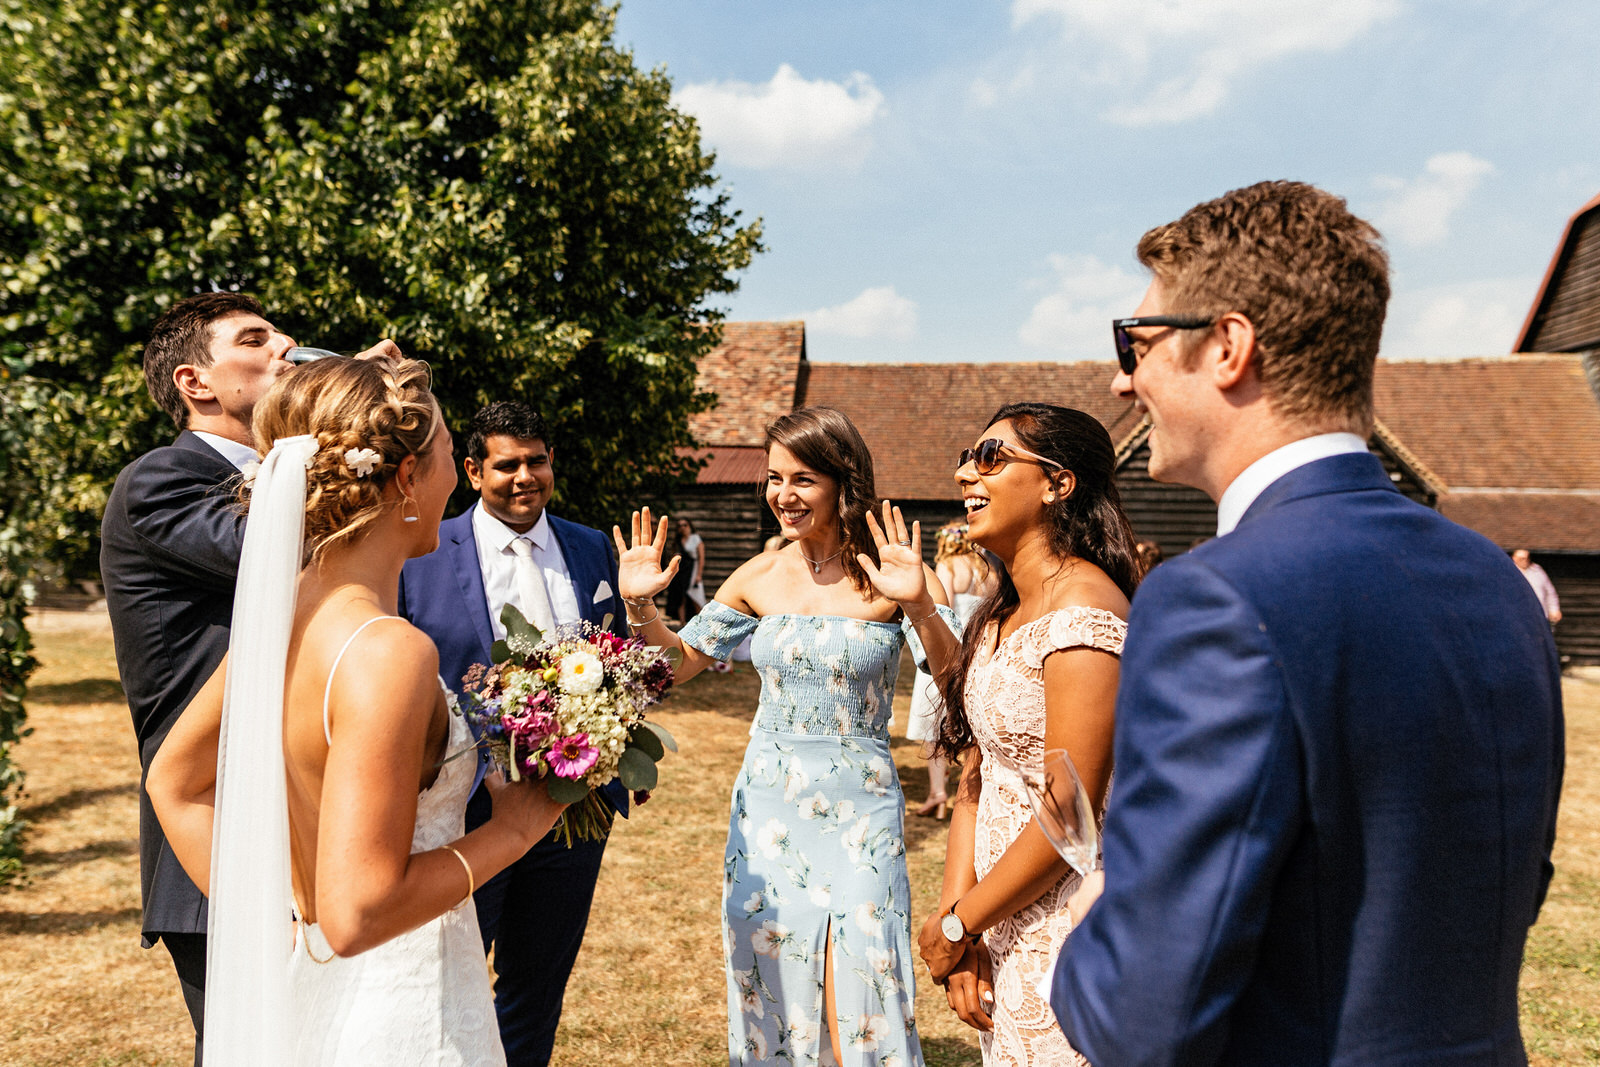 Edworth-Manor-Farm-Wedding-Photographer-038.jpg